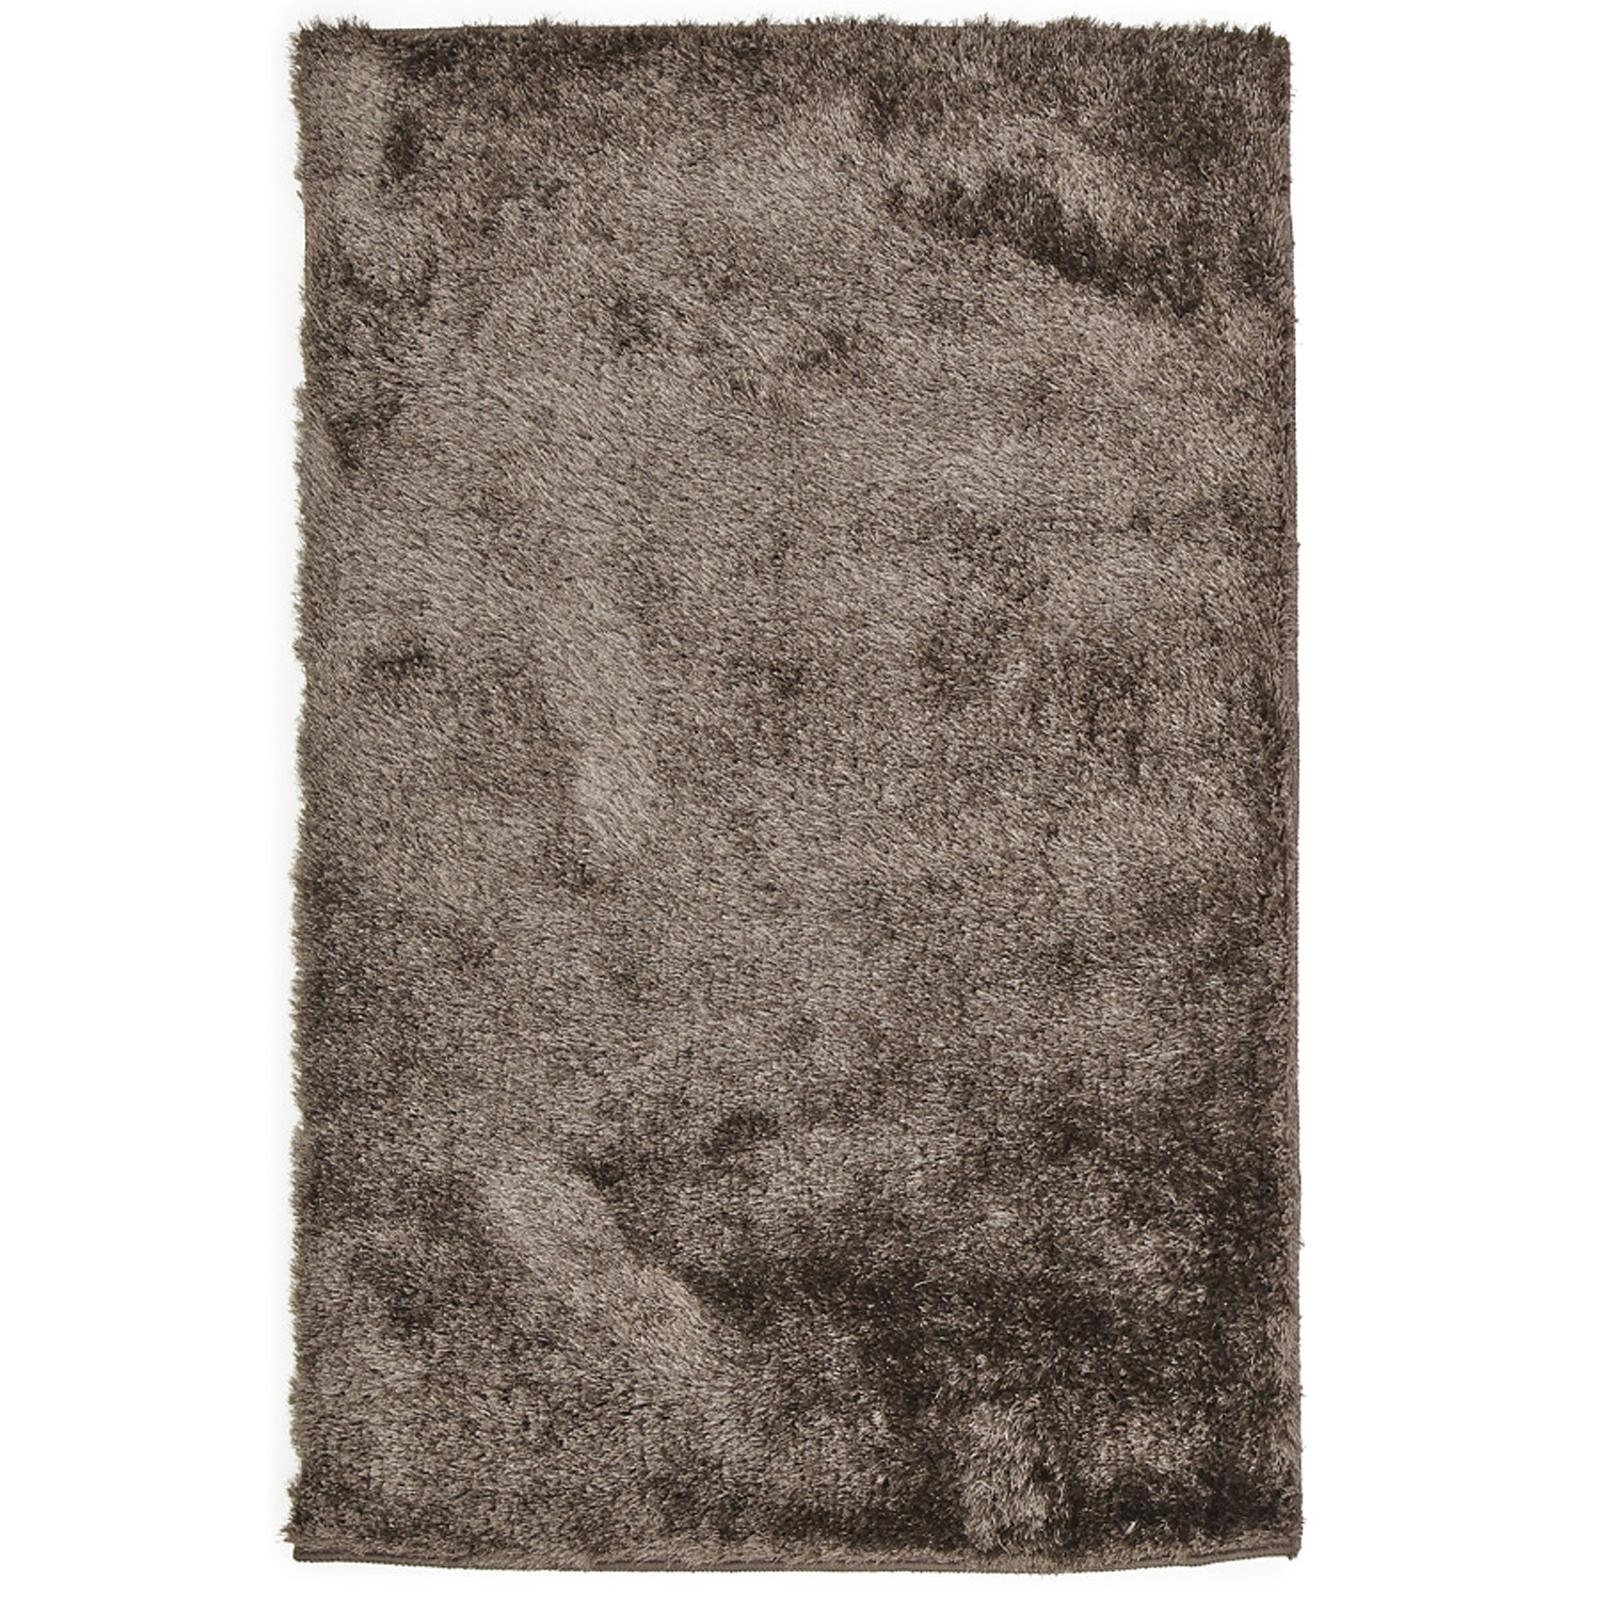 rug texture new-floor-rug-modern-thick-soft-plush-shag- IPHGRZM